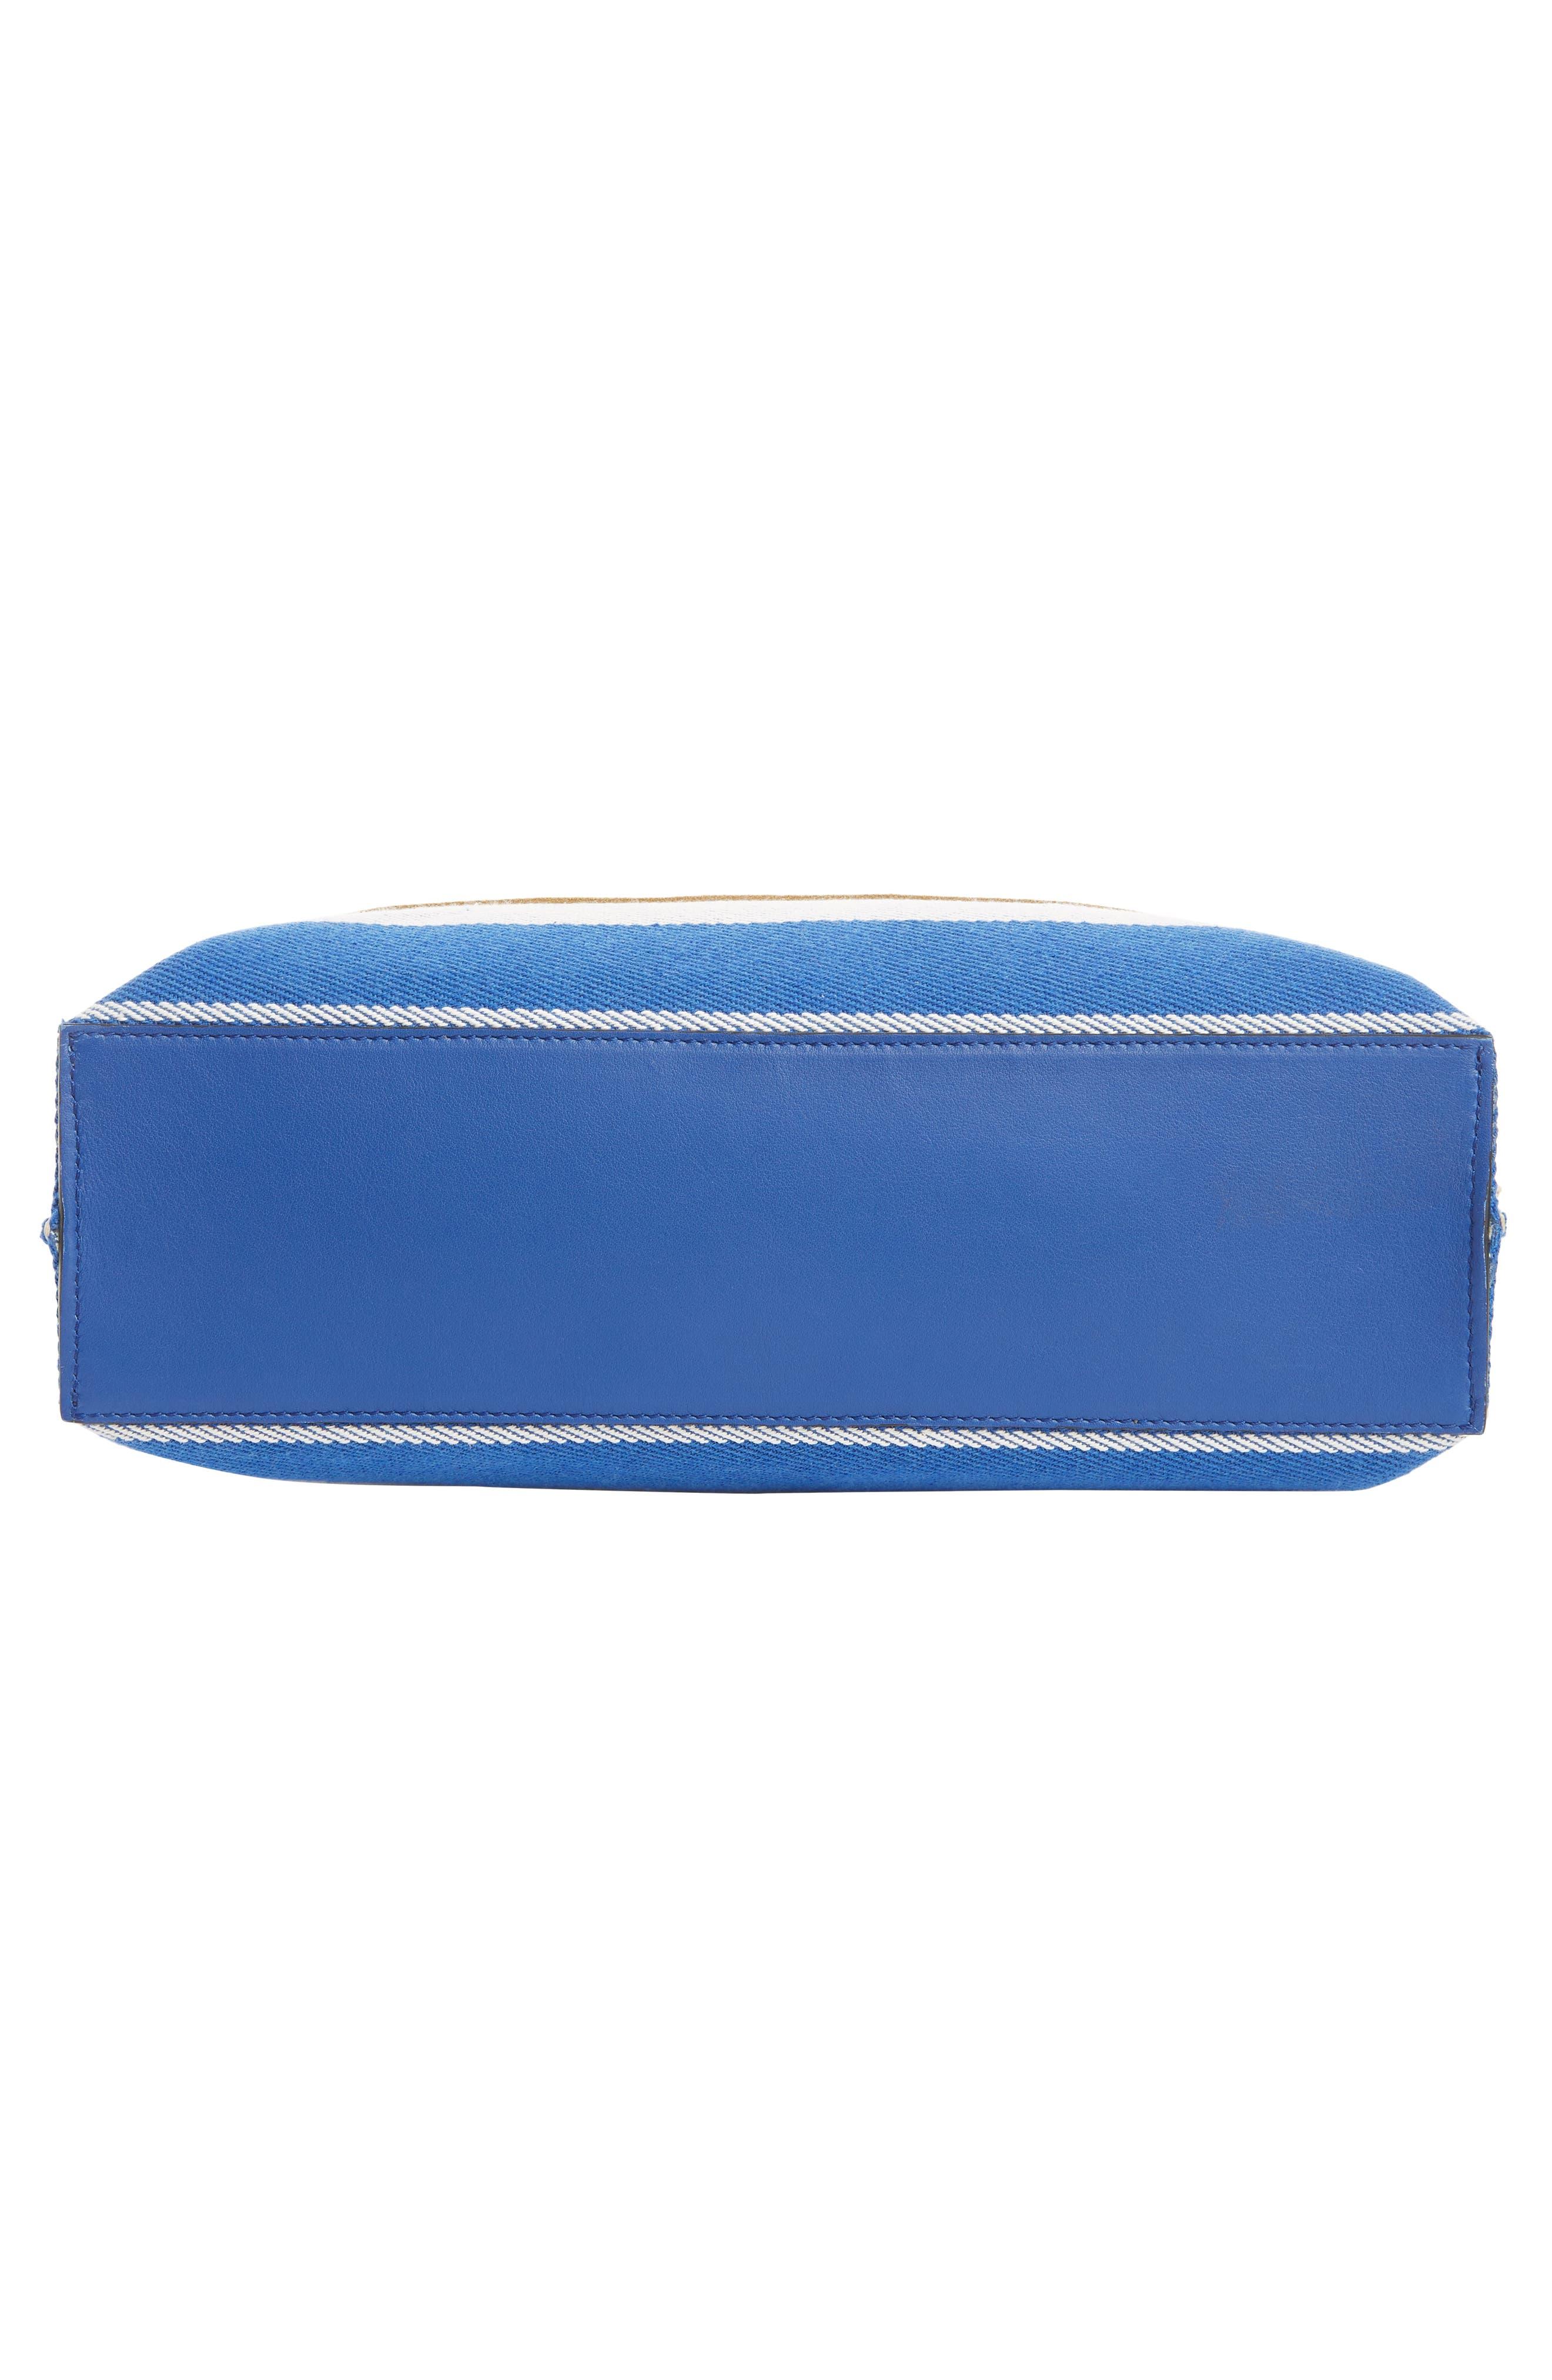 LOEWE, Stripe Twill Tote Bag, Alternate thumbnail 5, color, PACIFIC BLUE/MULTICOLOR